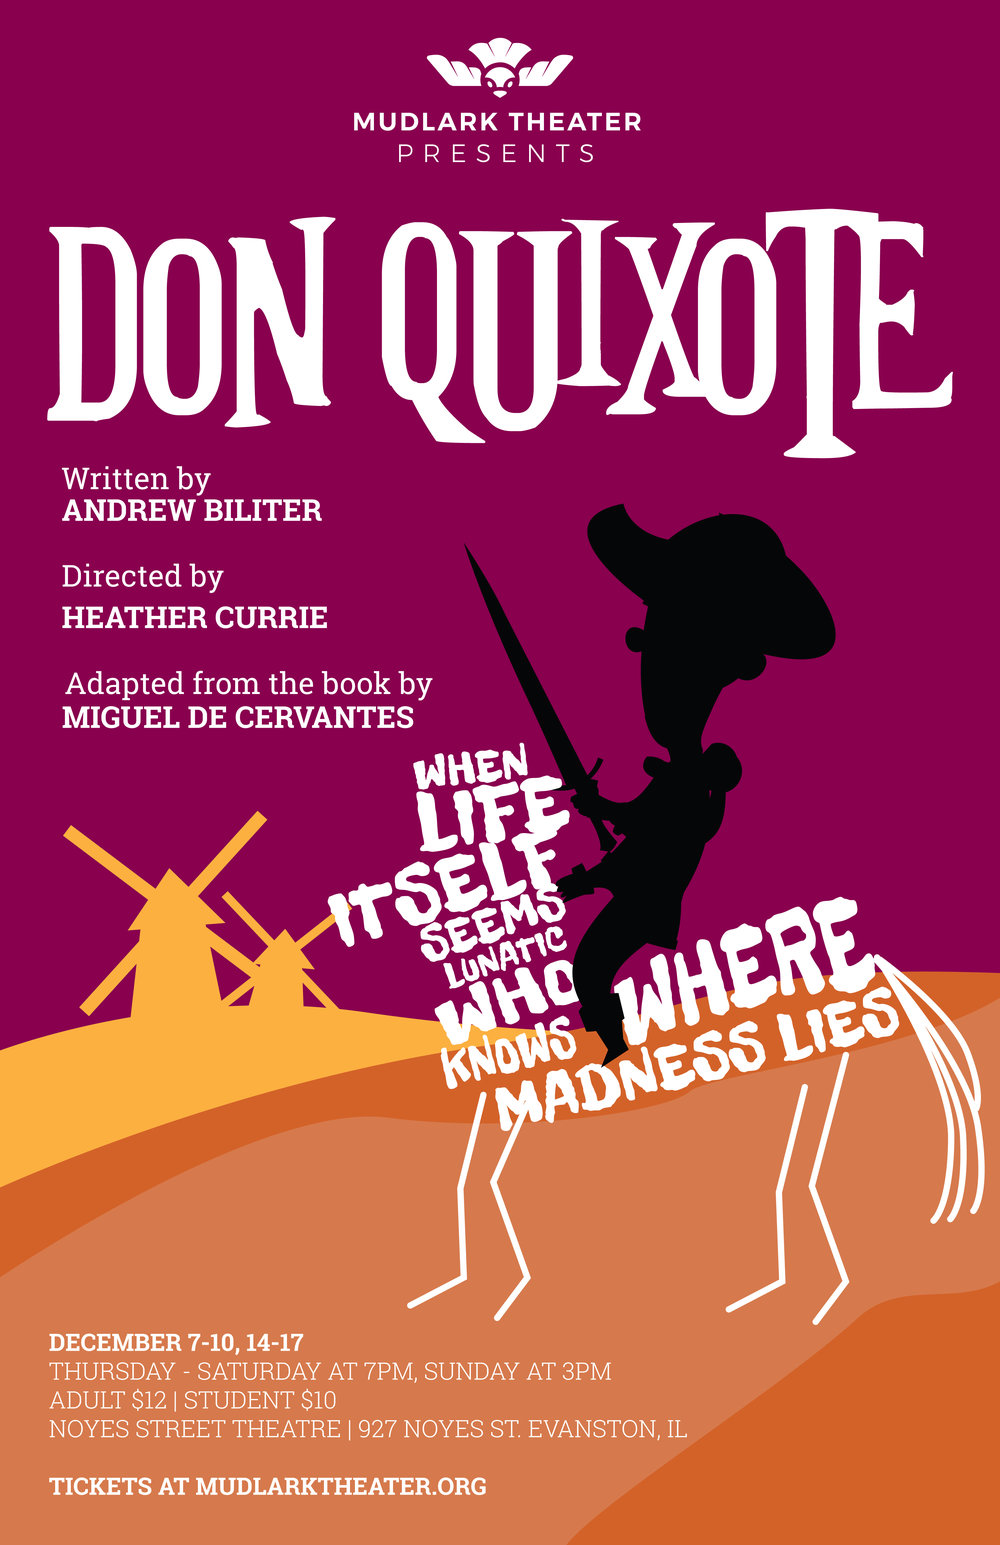 DonQuixote_Poster.jpg